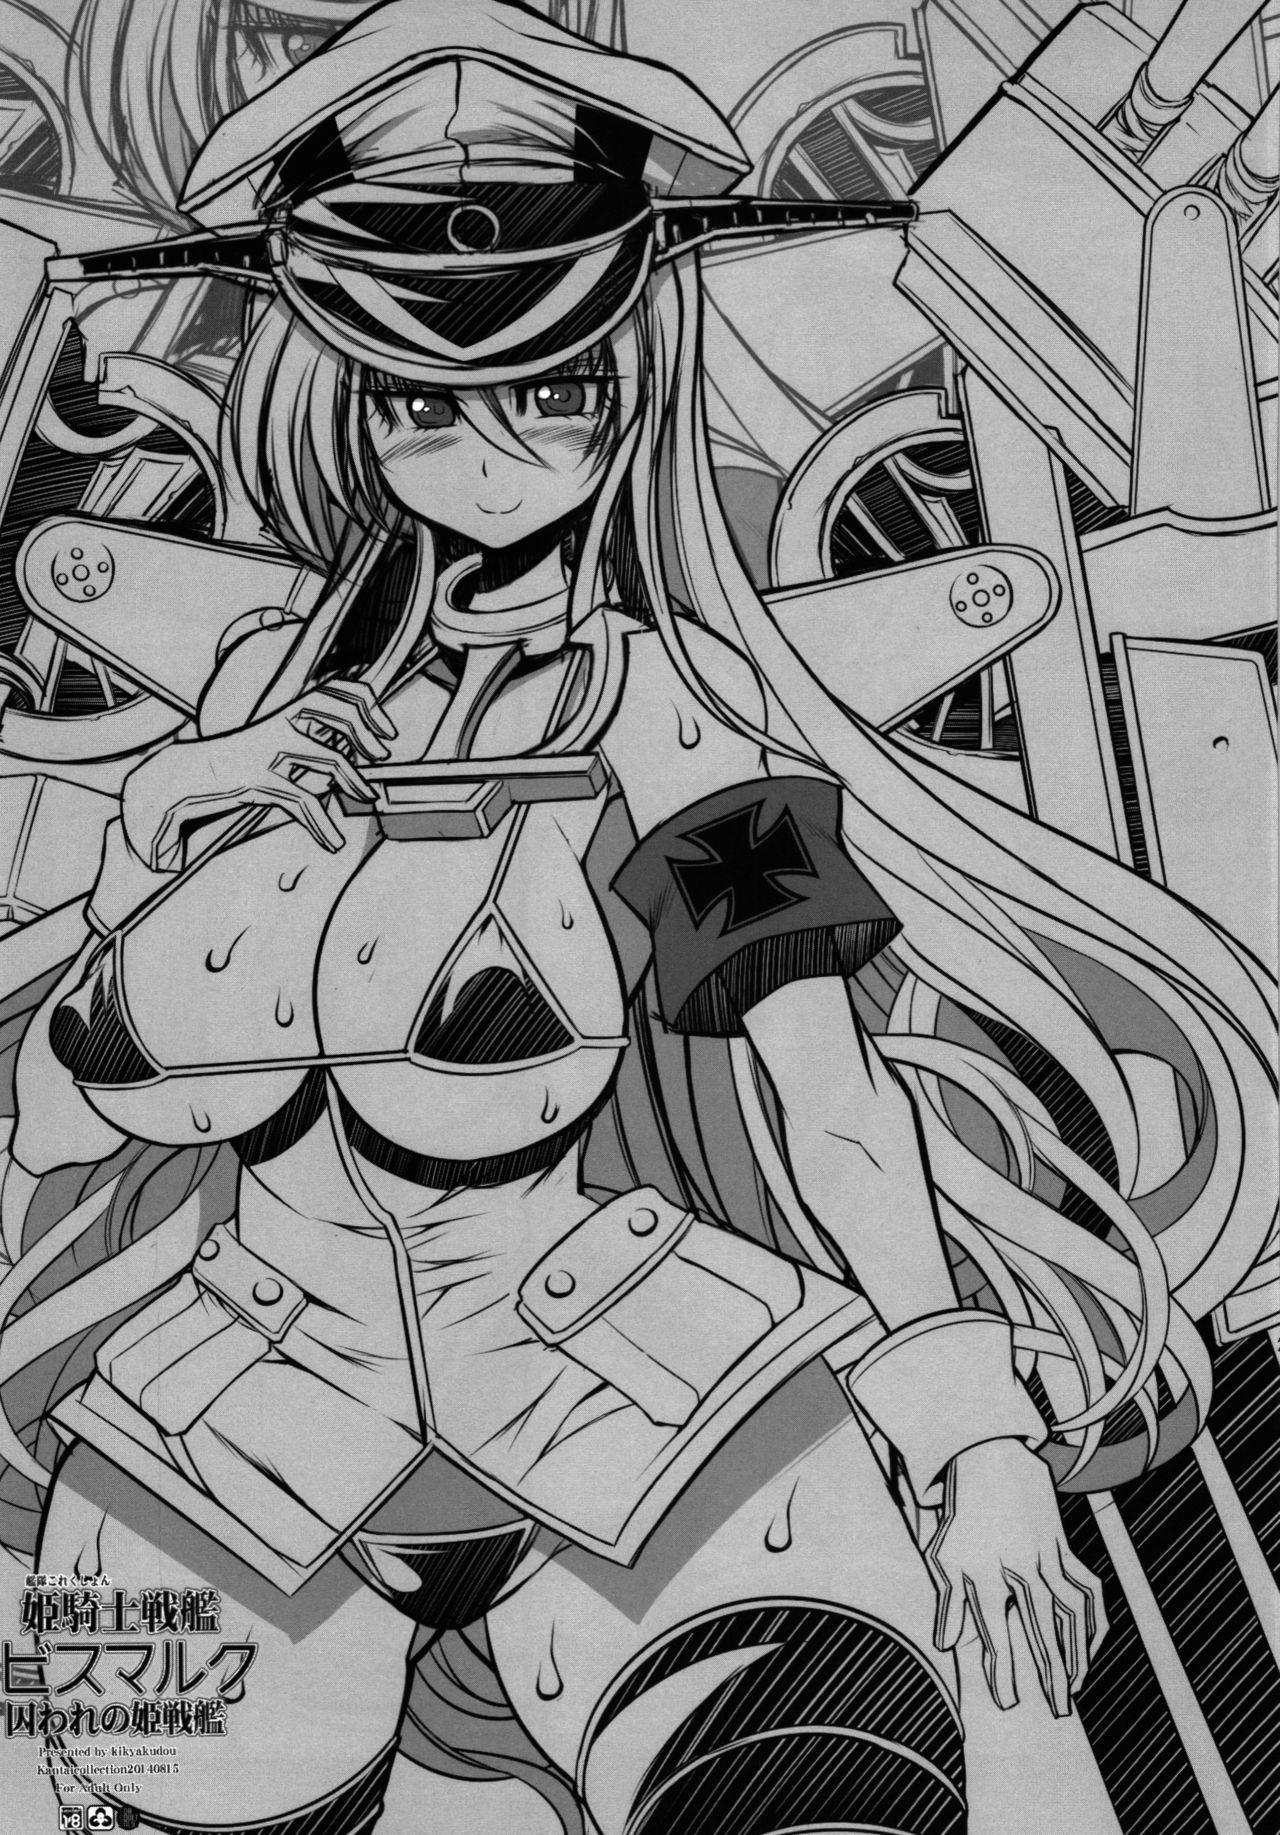 Himekishi Senkan Bismarck Toraware no Himesenkan | The Captured Princess Knight Battleship Bismarck 22